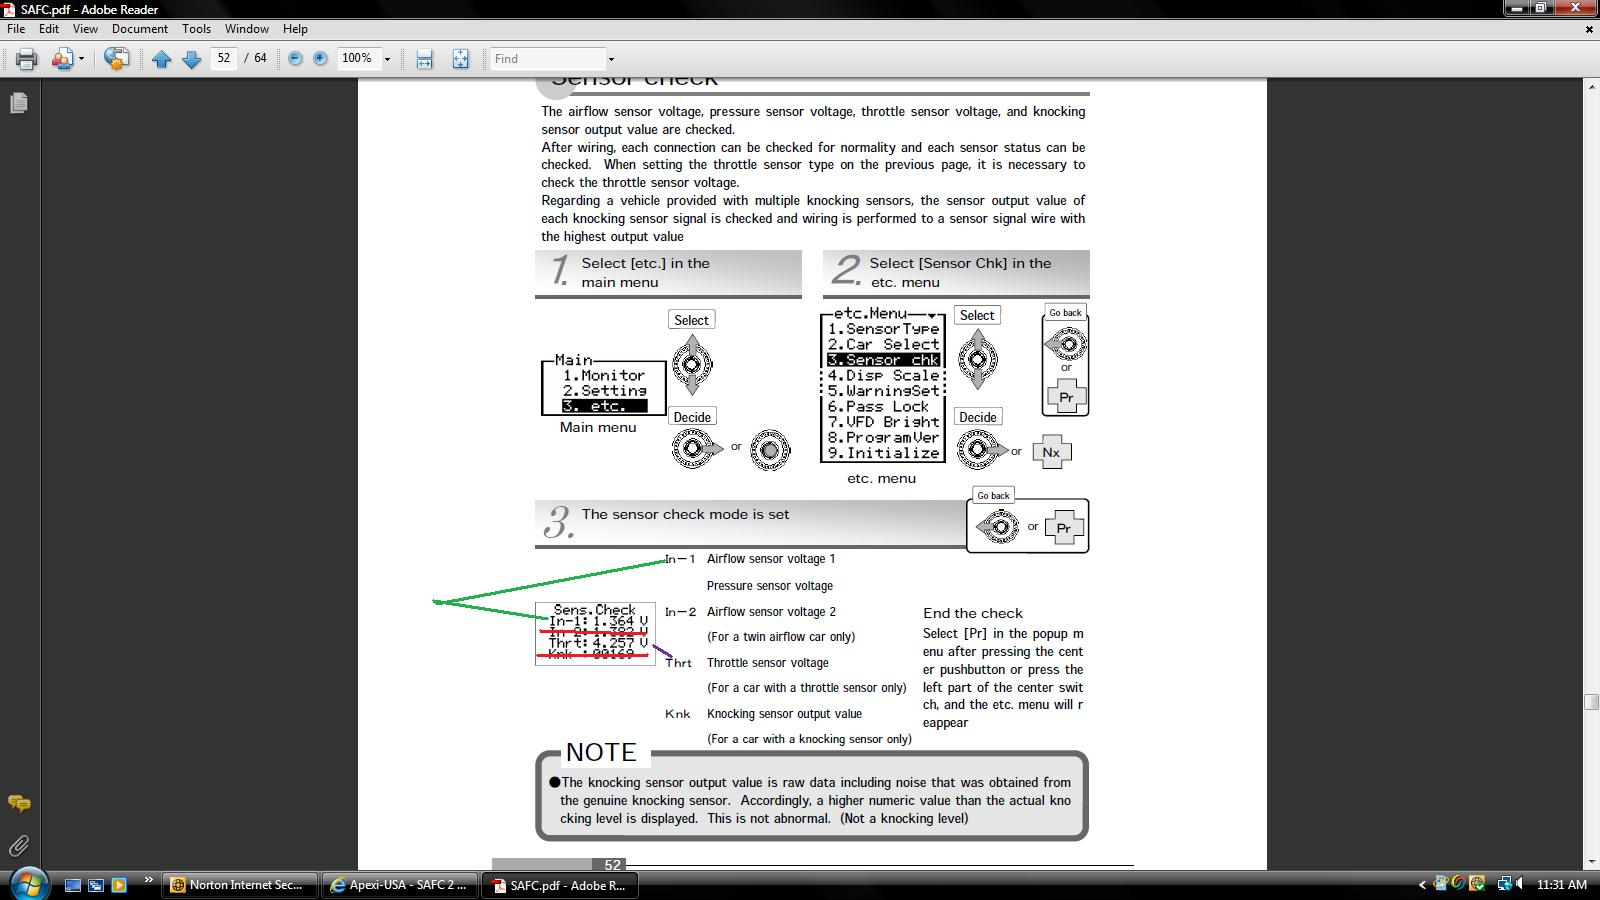 Ka24de wiring diagram pdf efcaviation ka24de wiring diagram pdf ka24de apexi safc wiring diagram apexi safc 2 wiring harness asfbconference2016 Image collections